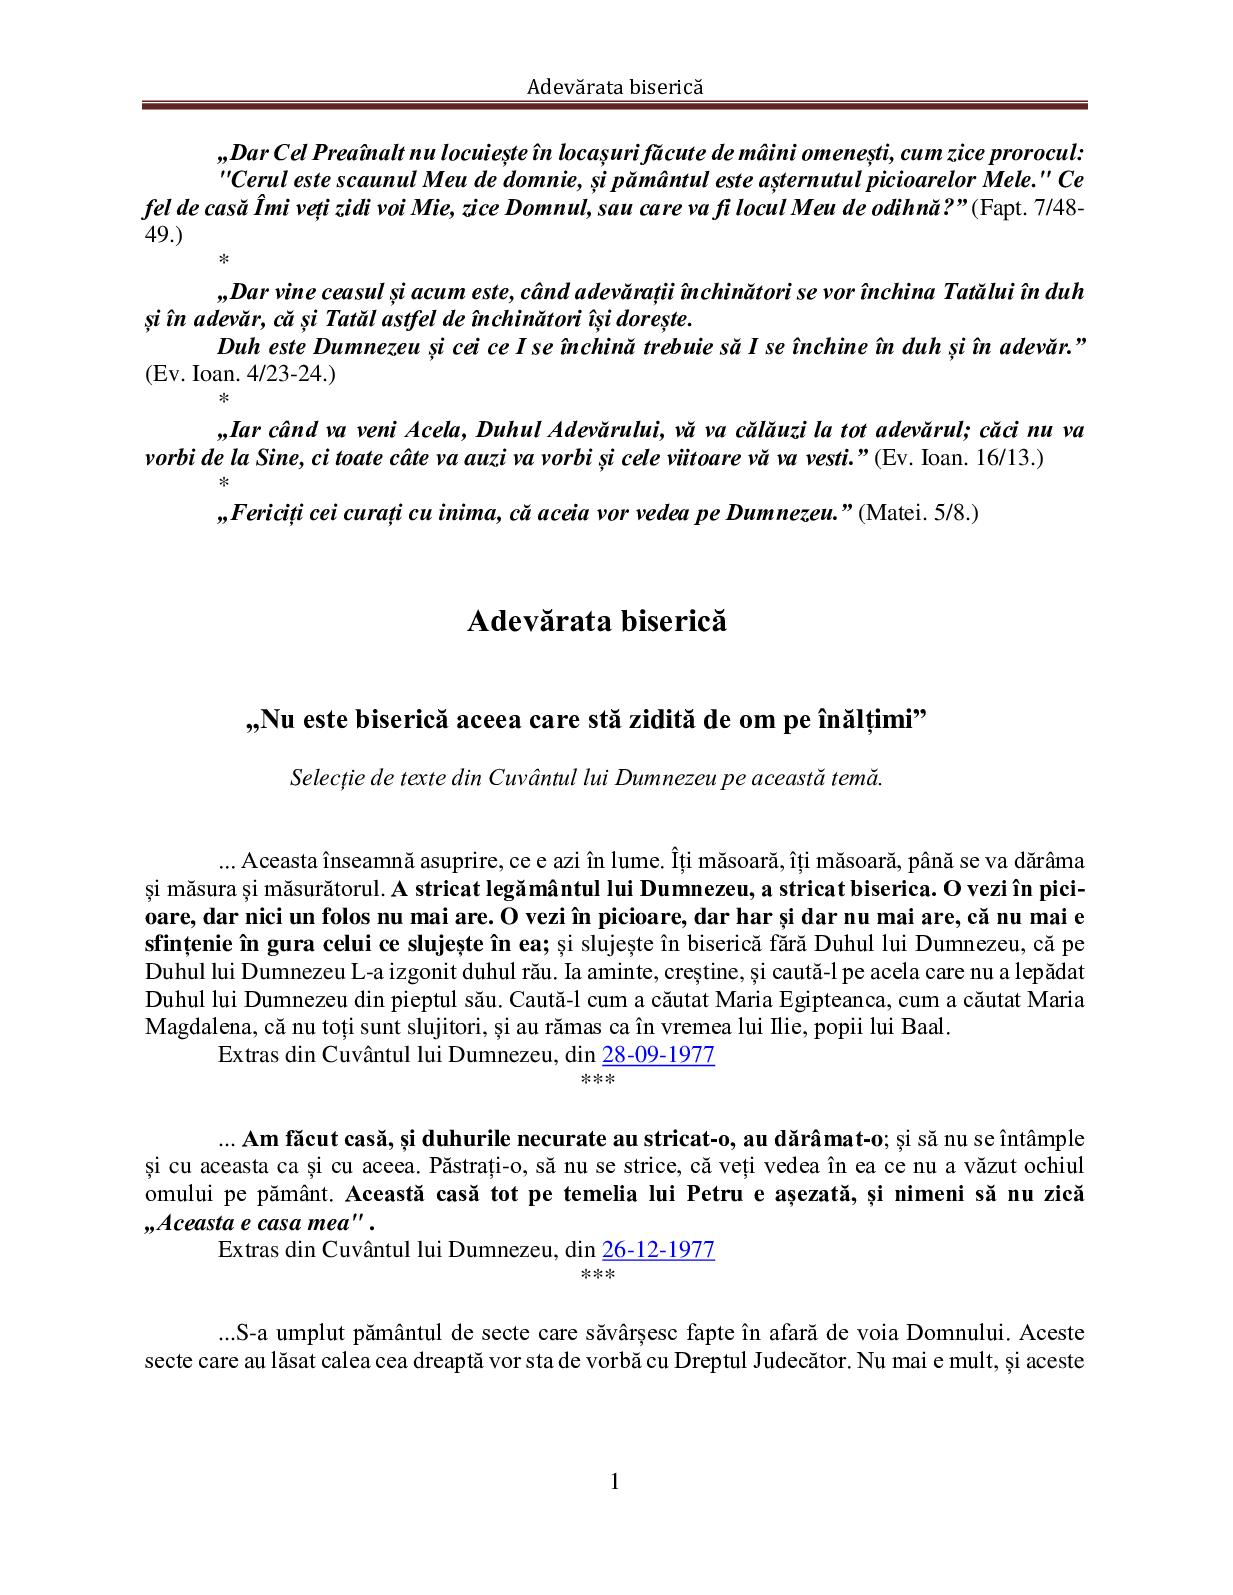 viermii pentru copii sunt tratati cu orz)